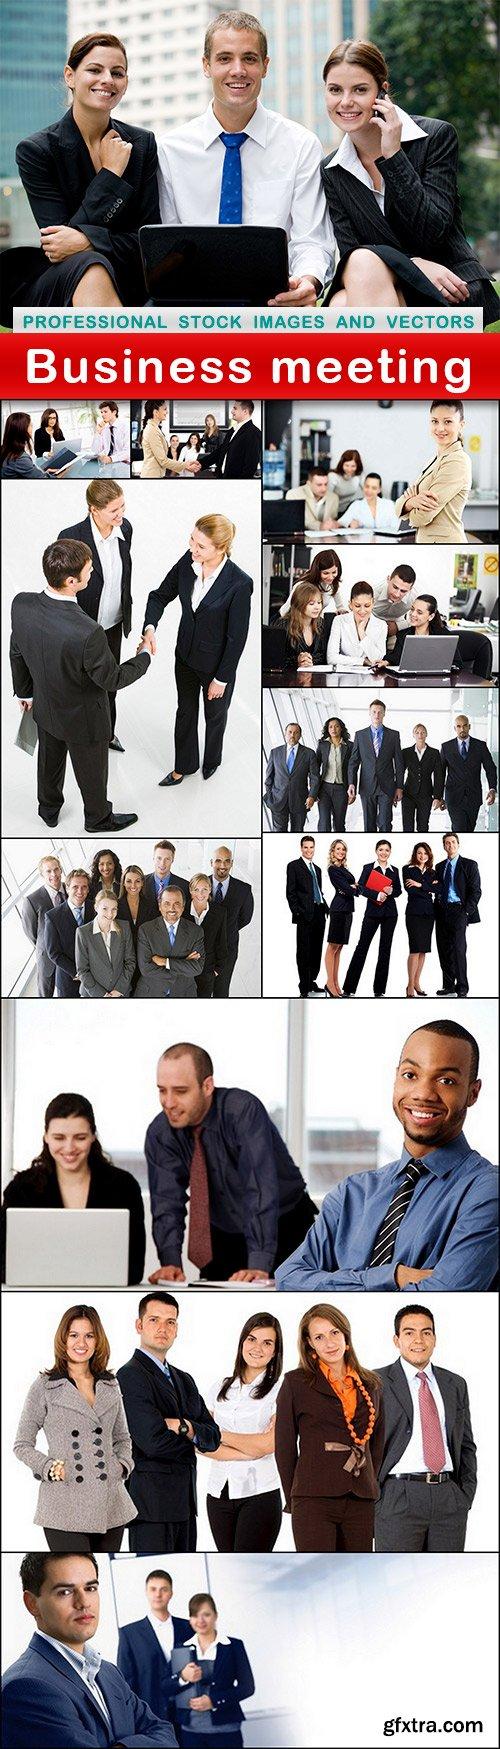 Business meeting - 12 UHQ JPEG